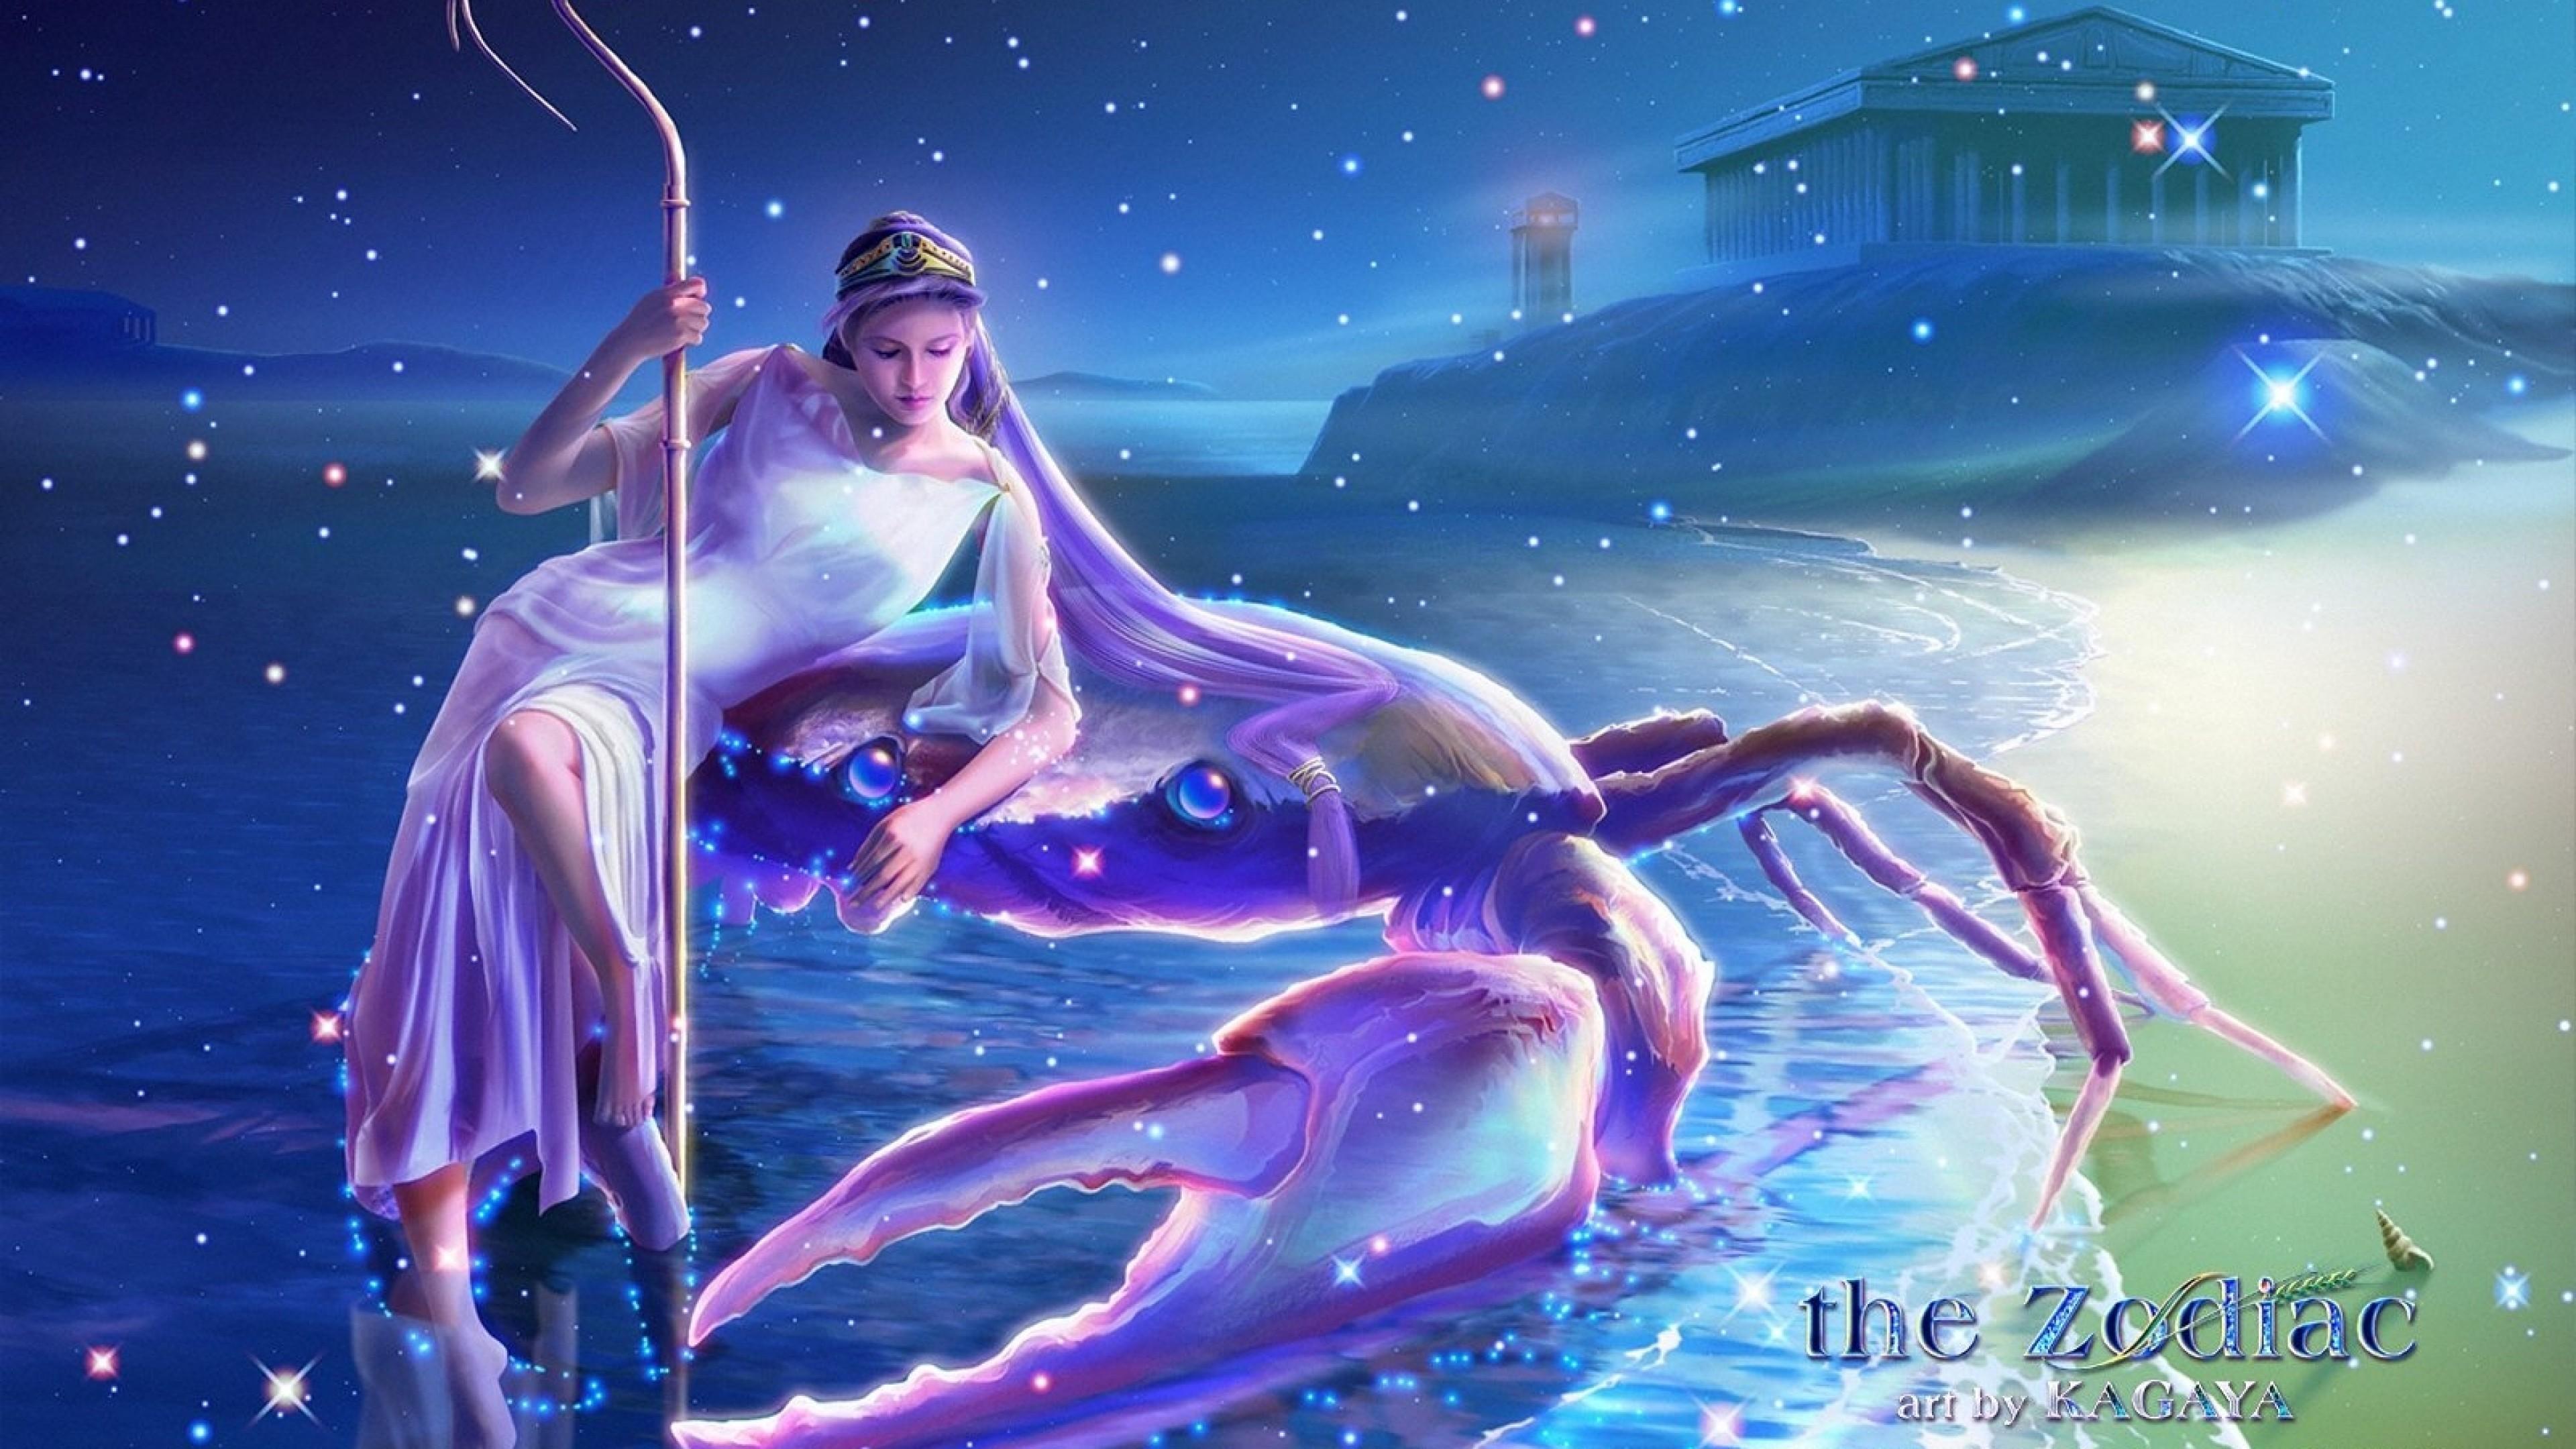 Wallpaper zodiac, sign, cancer, water, girl